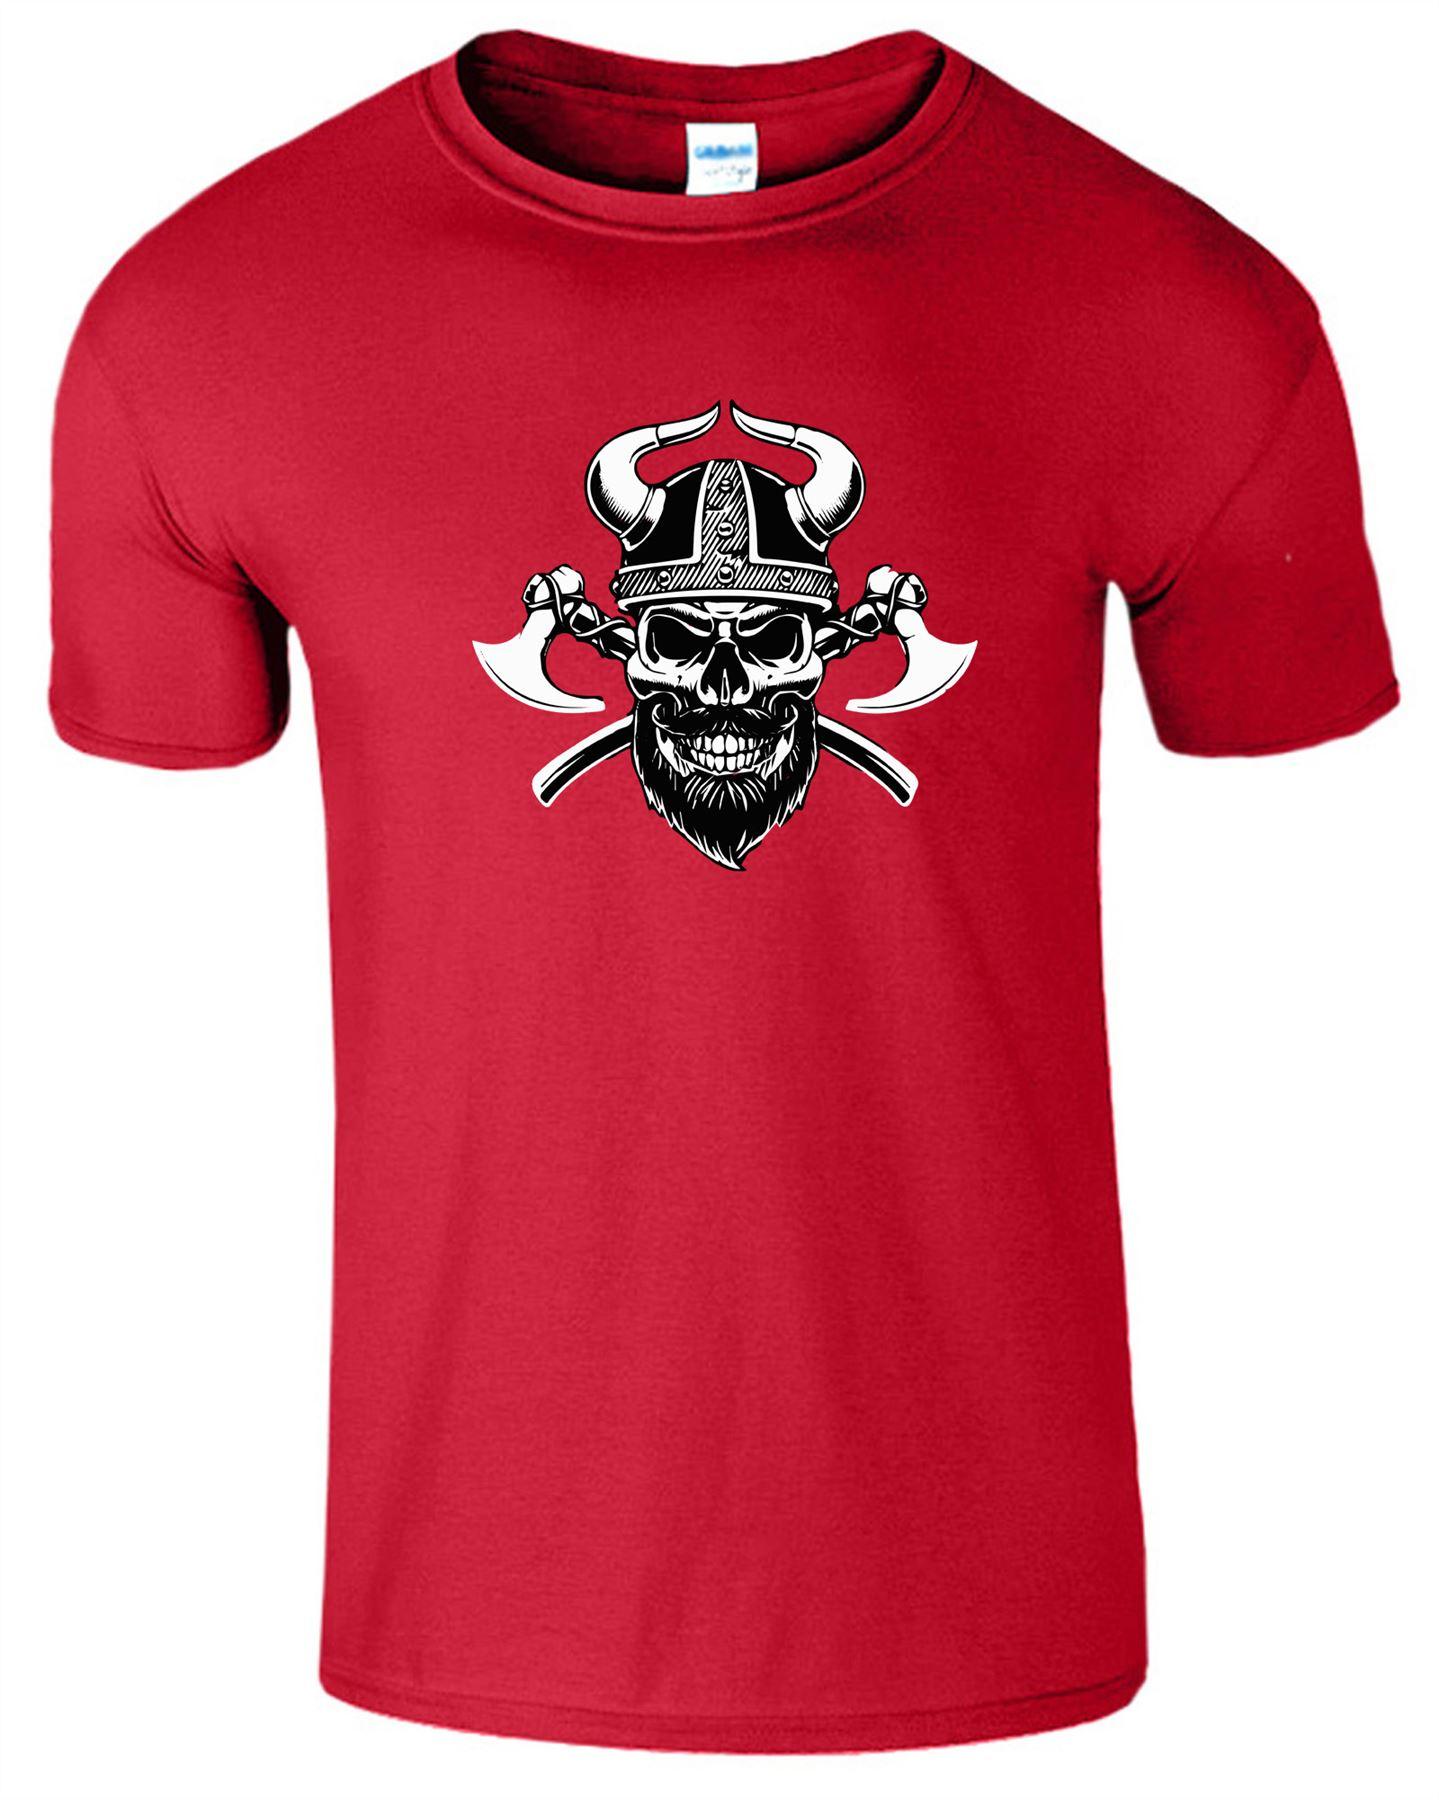 Mens Muscle Fit T Shirt Bodybuilding Crossfit Gym Top UK Seller for Viking Fans